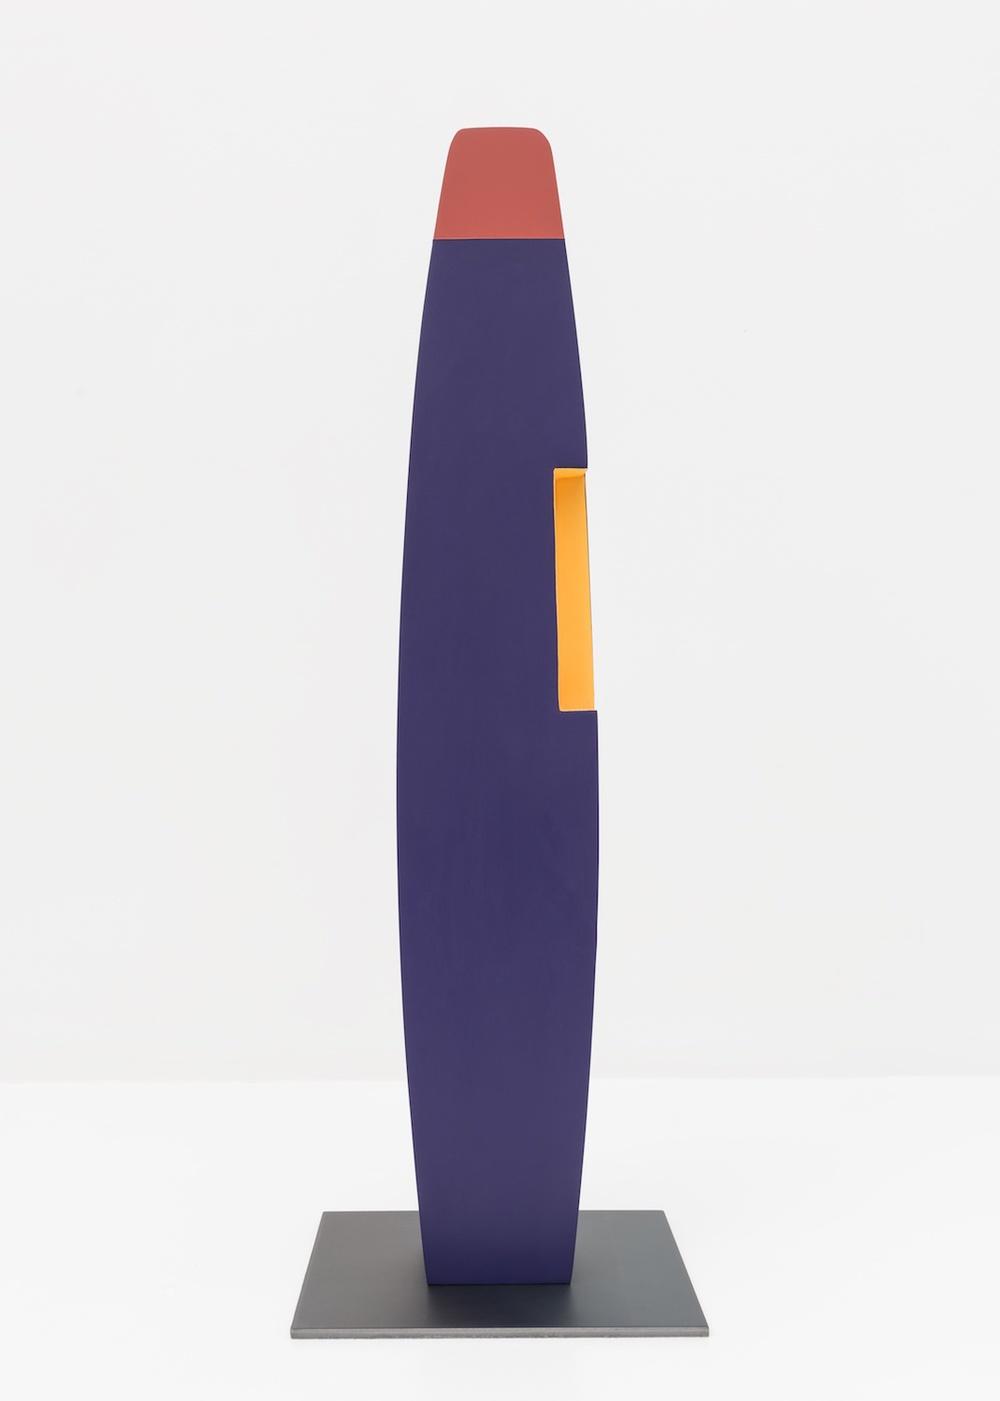 Lisa Williamson  Untitled  2015 Acrylic on wood, steel base 23 ½h x 8w x 8d in LW149